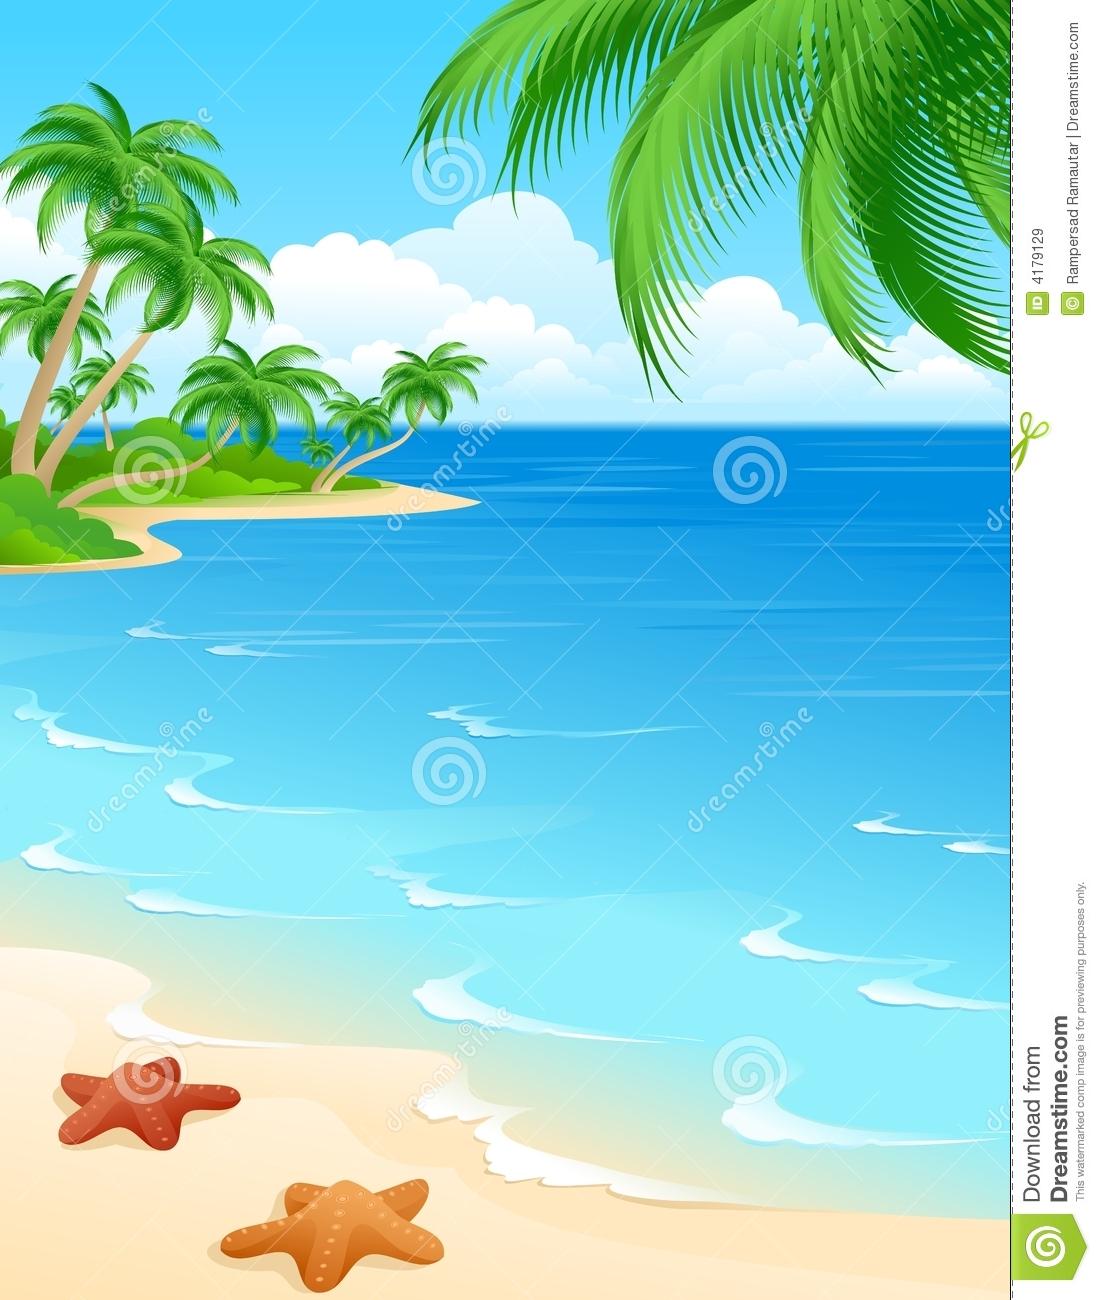 Free Clip Art Beach Beach Scene Royalty Free Stock Images Image